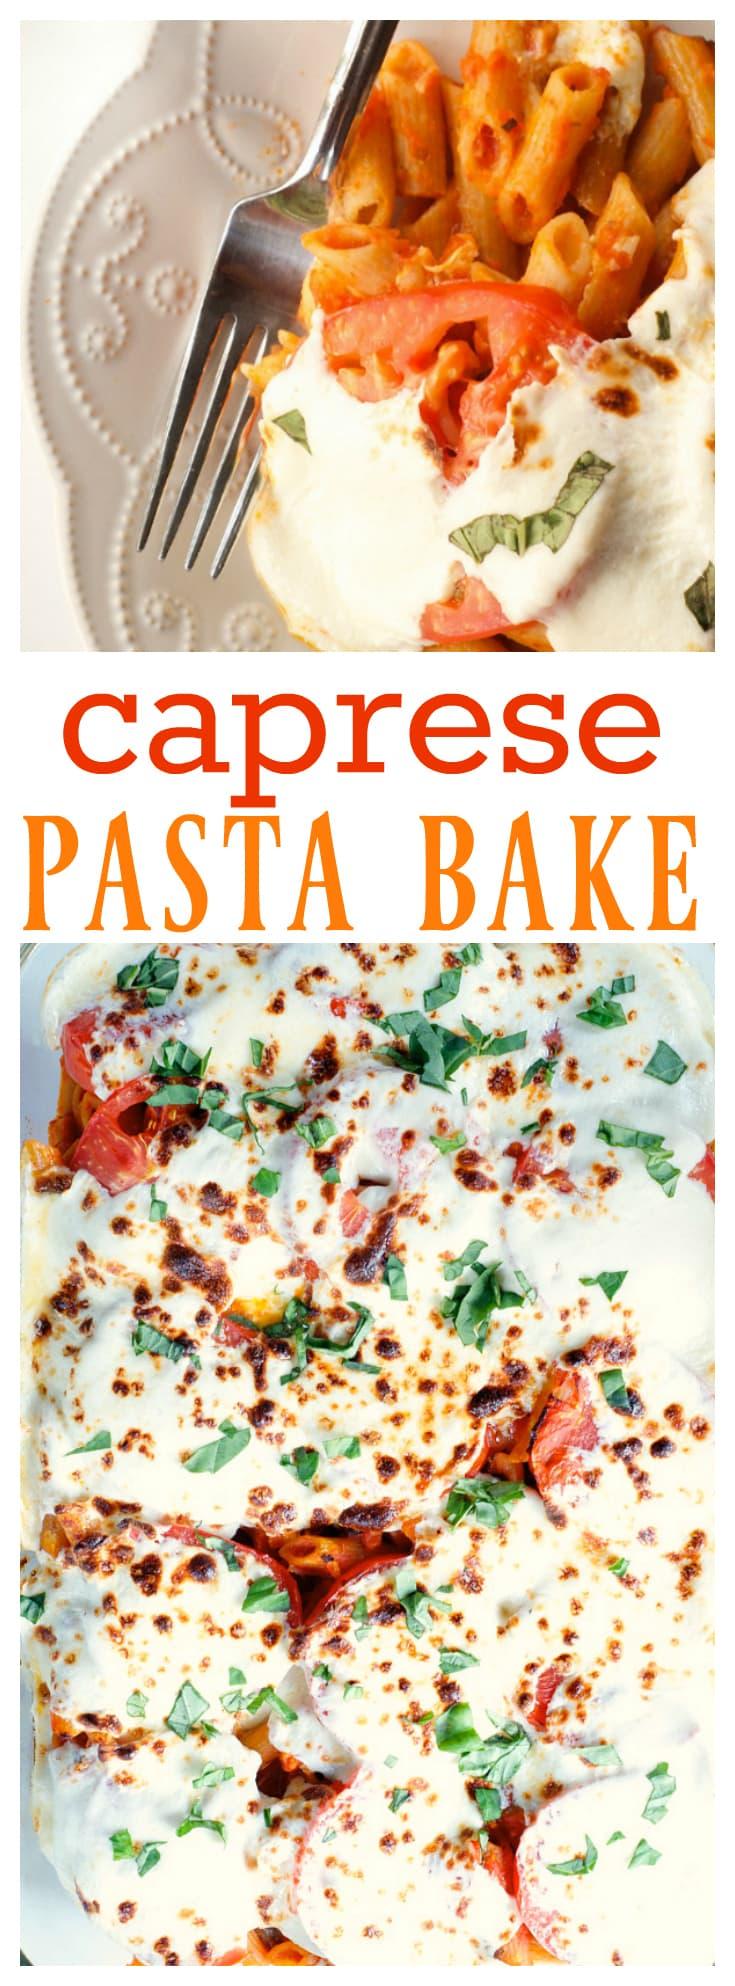 Caprese Pasta Bake with Fresh Garden Tomatoes